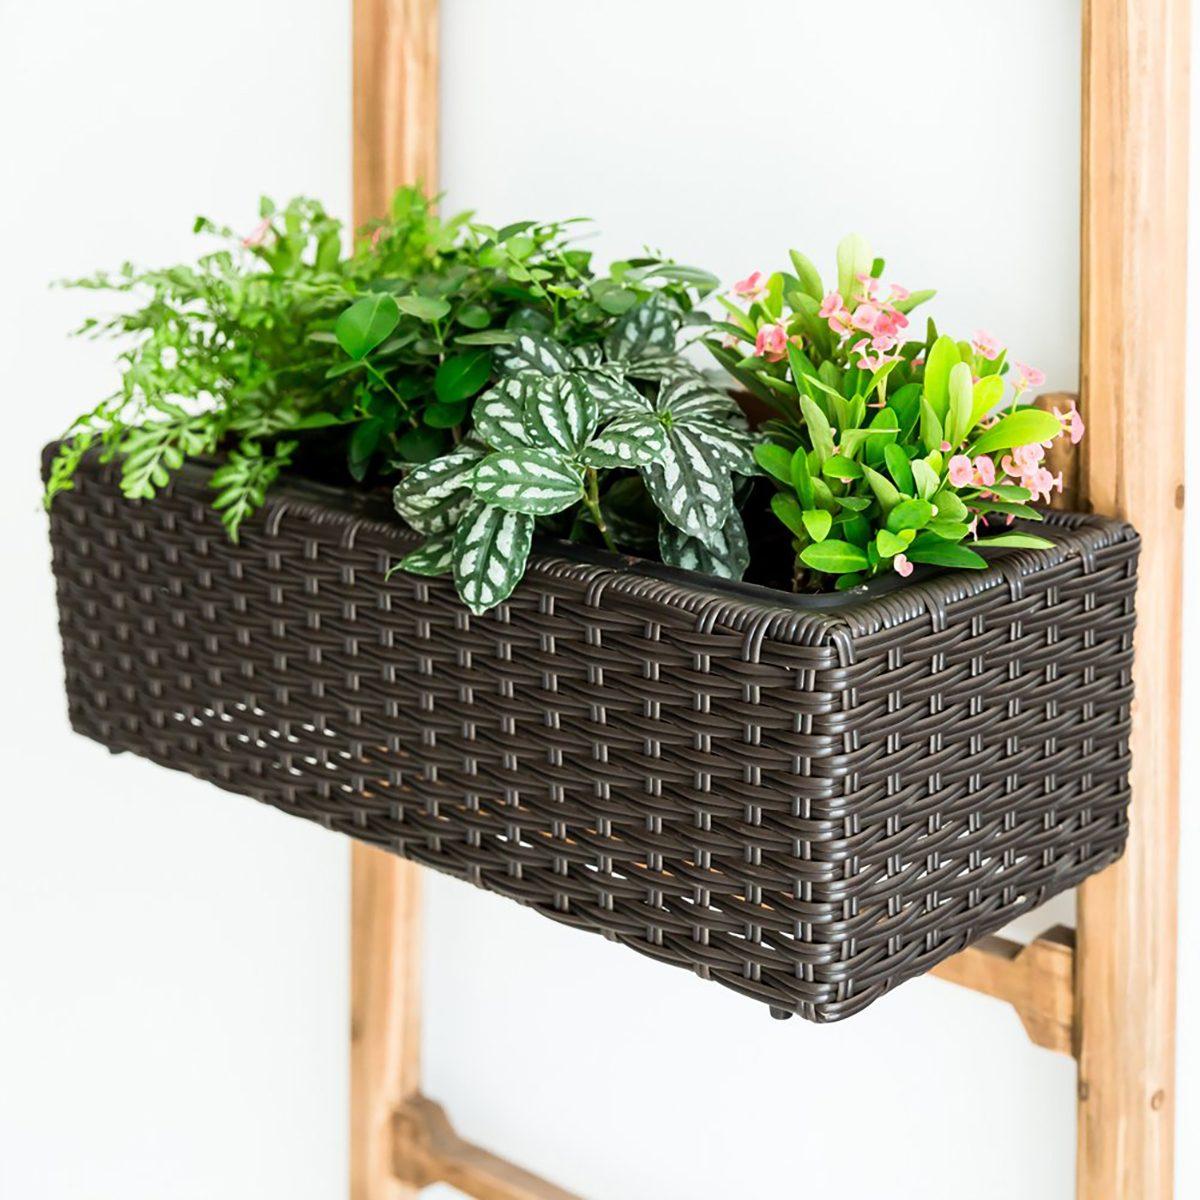 Wicker planter box from Amazon